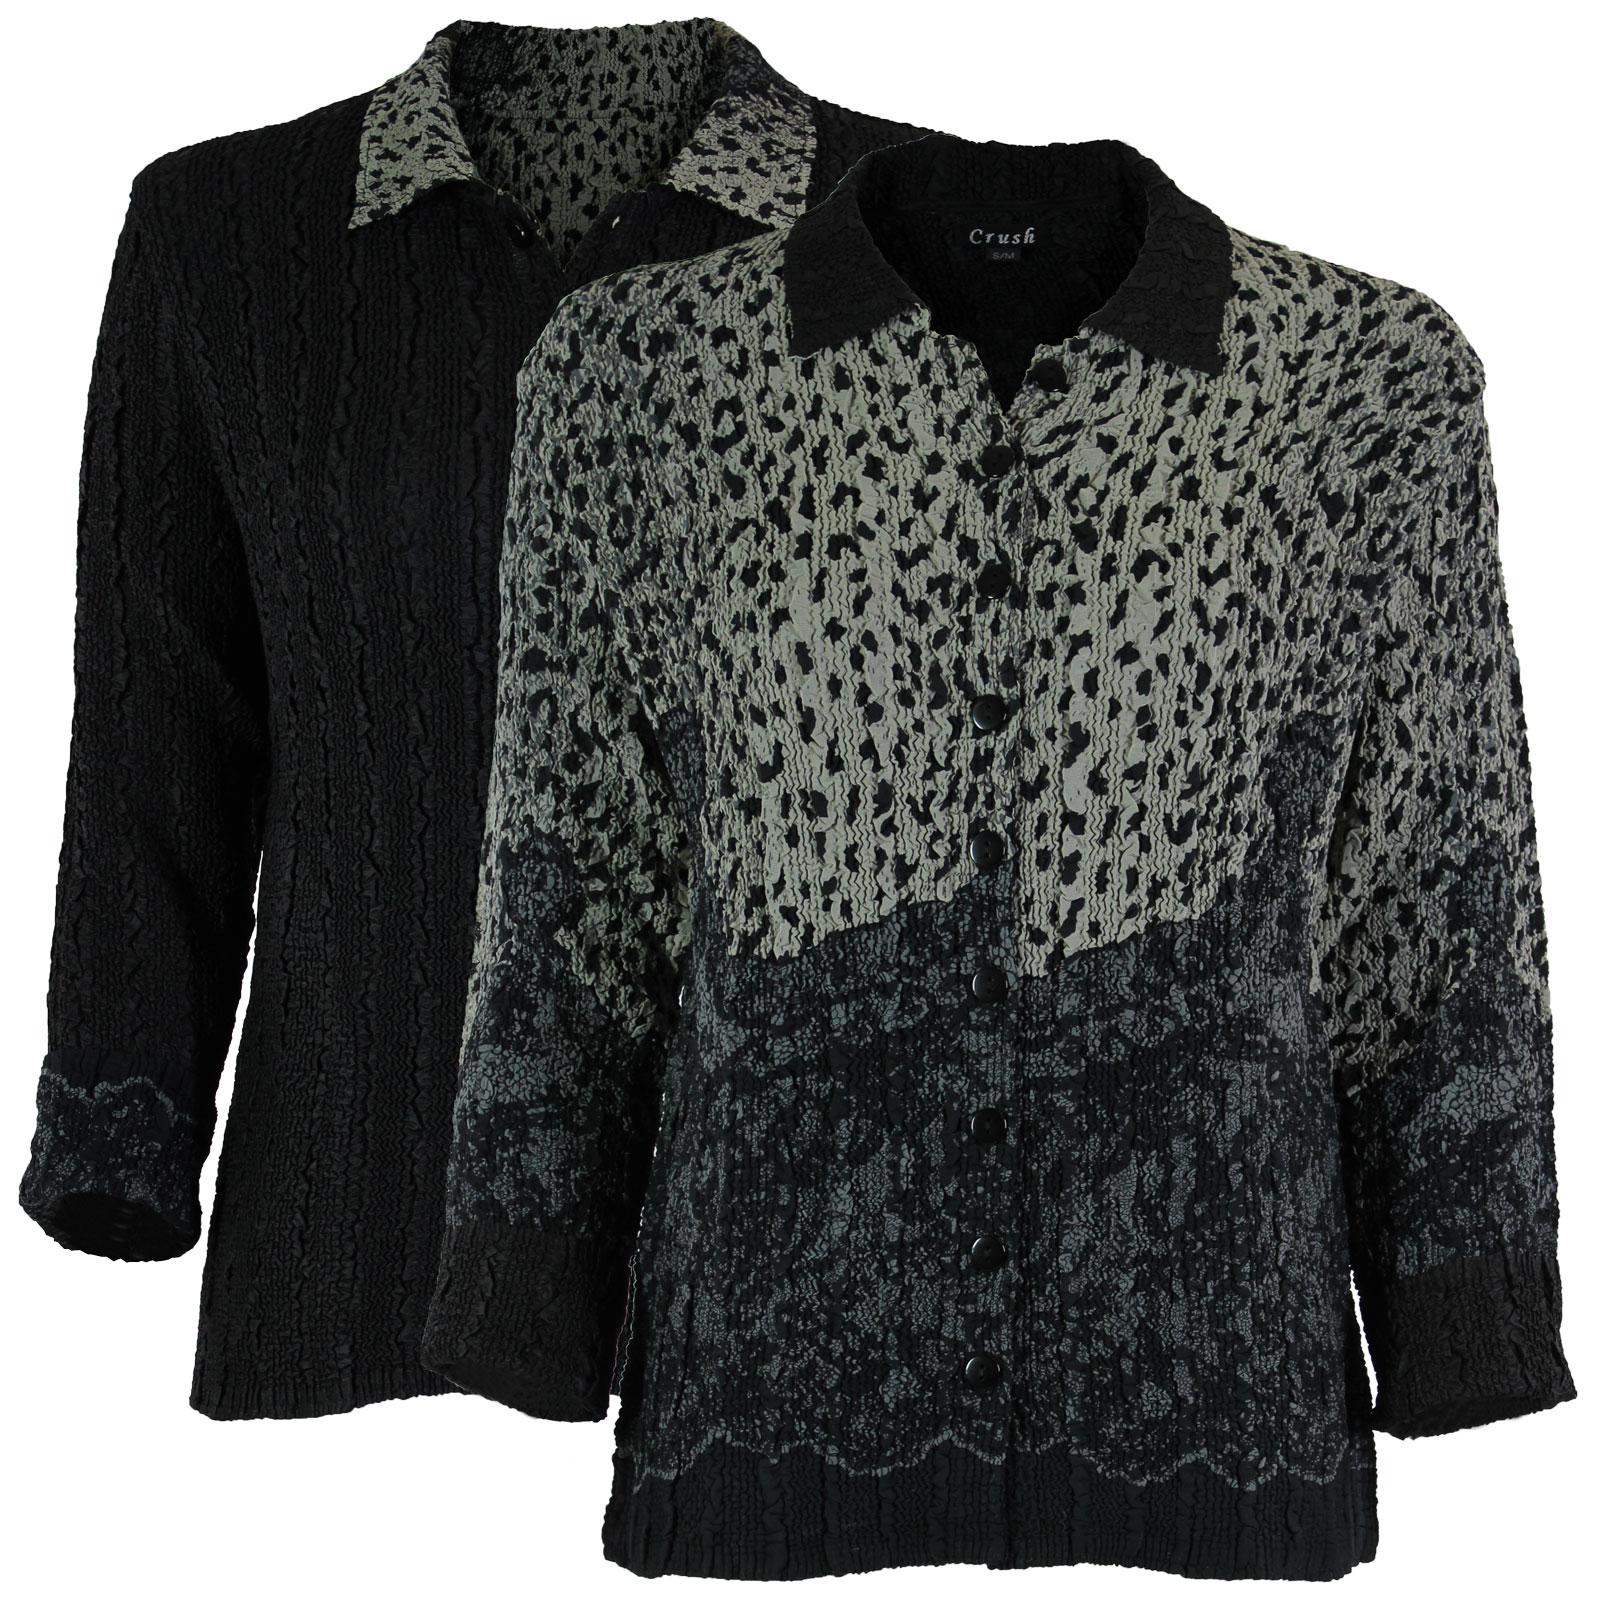 Wholesale Magic Crush - Reversible Jackets #3008 - 1X-2X